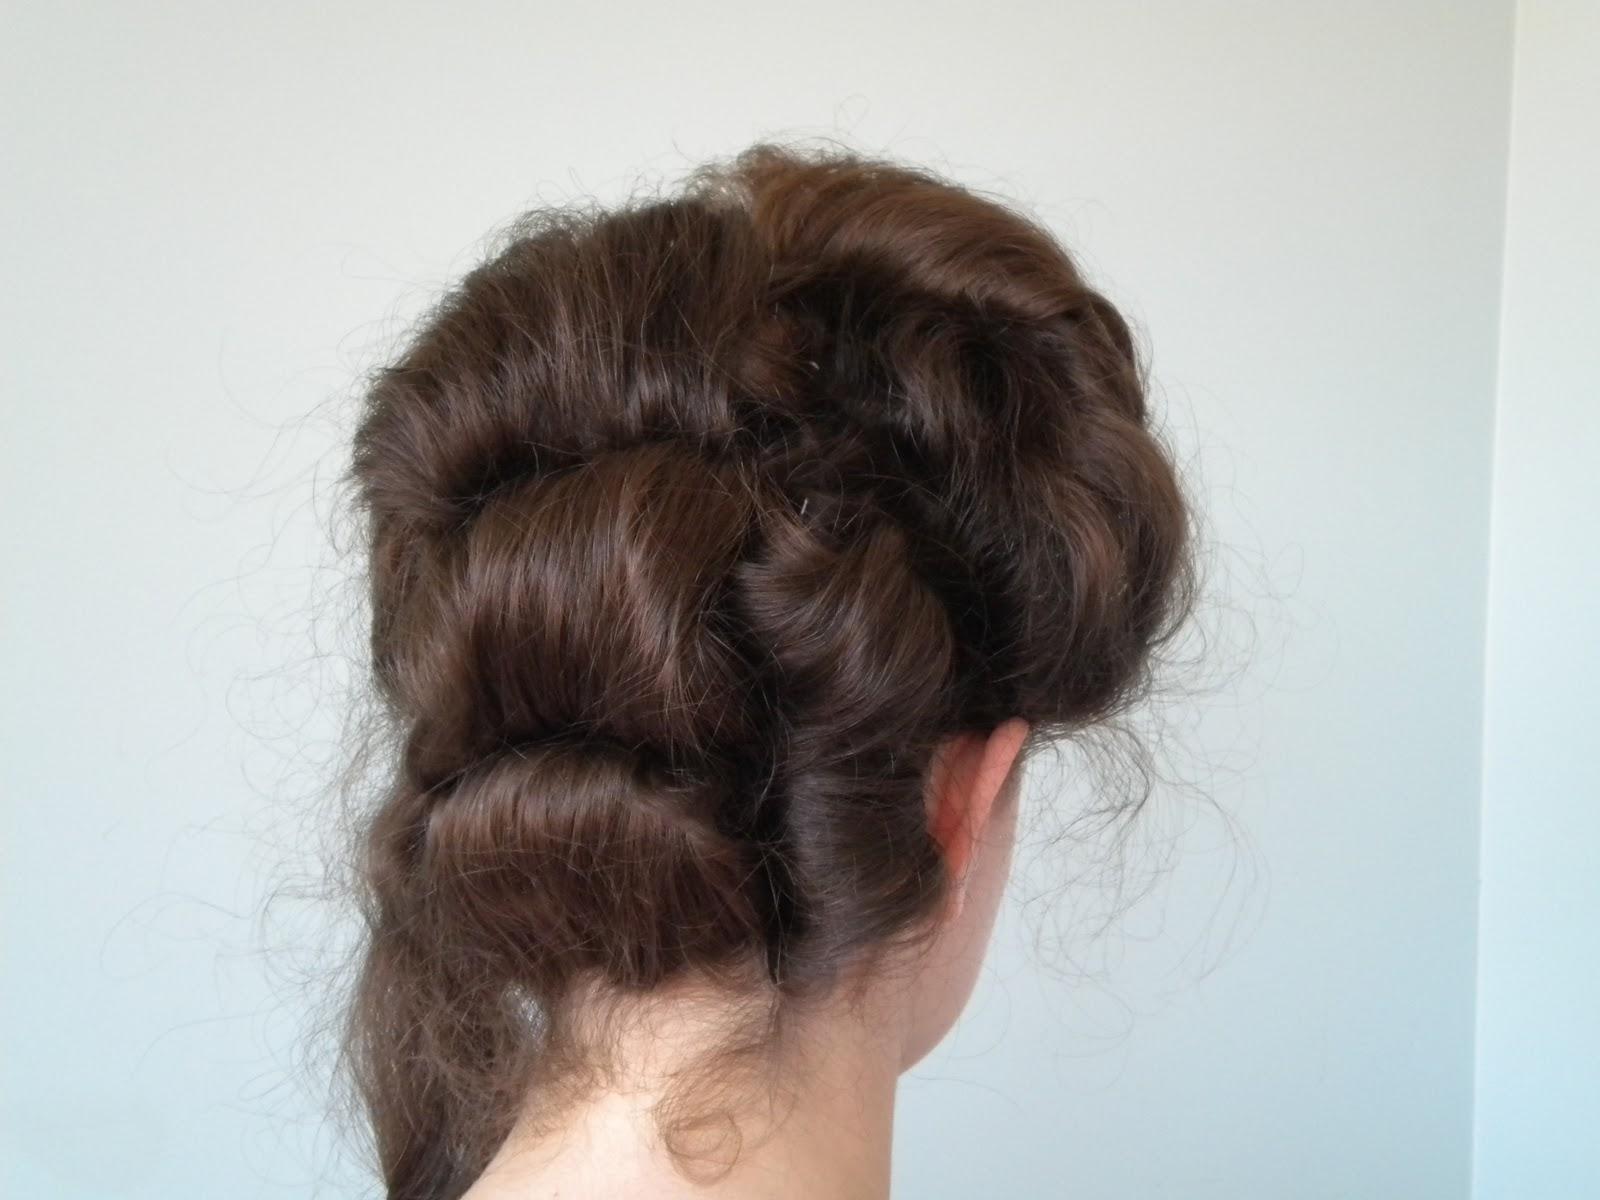 Pics Of Hair Styles: Hair Styles: Classic Georgian Hairstyle